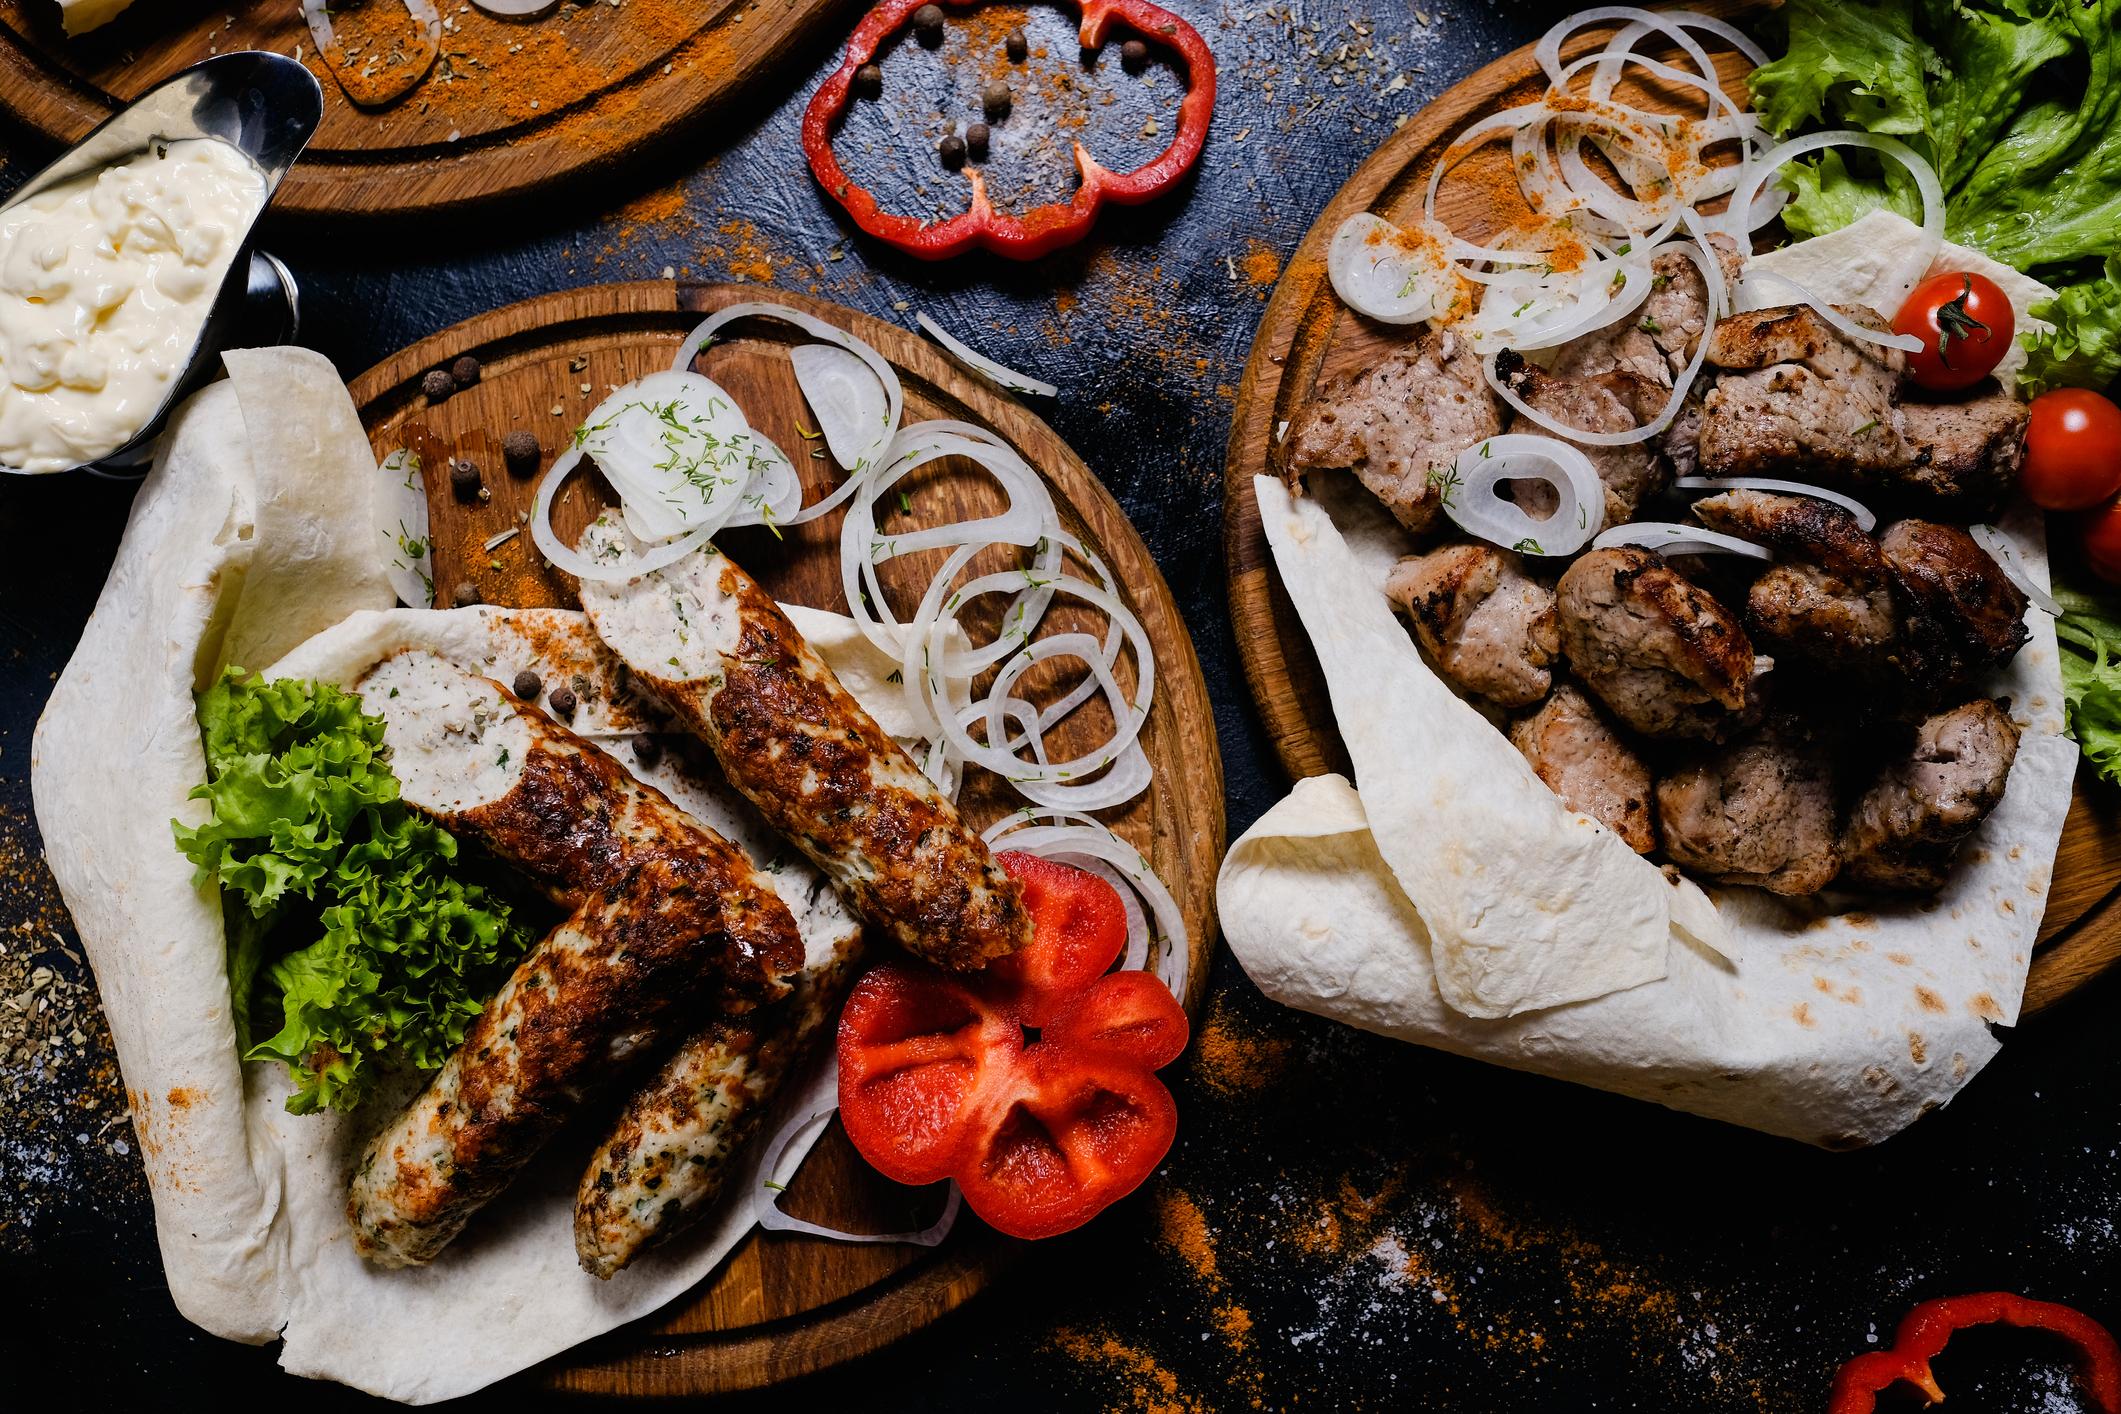 Take a culinary trip to Georgia, Armenia, and Azerbaijan for the hearty cuisine of the Caucasus